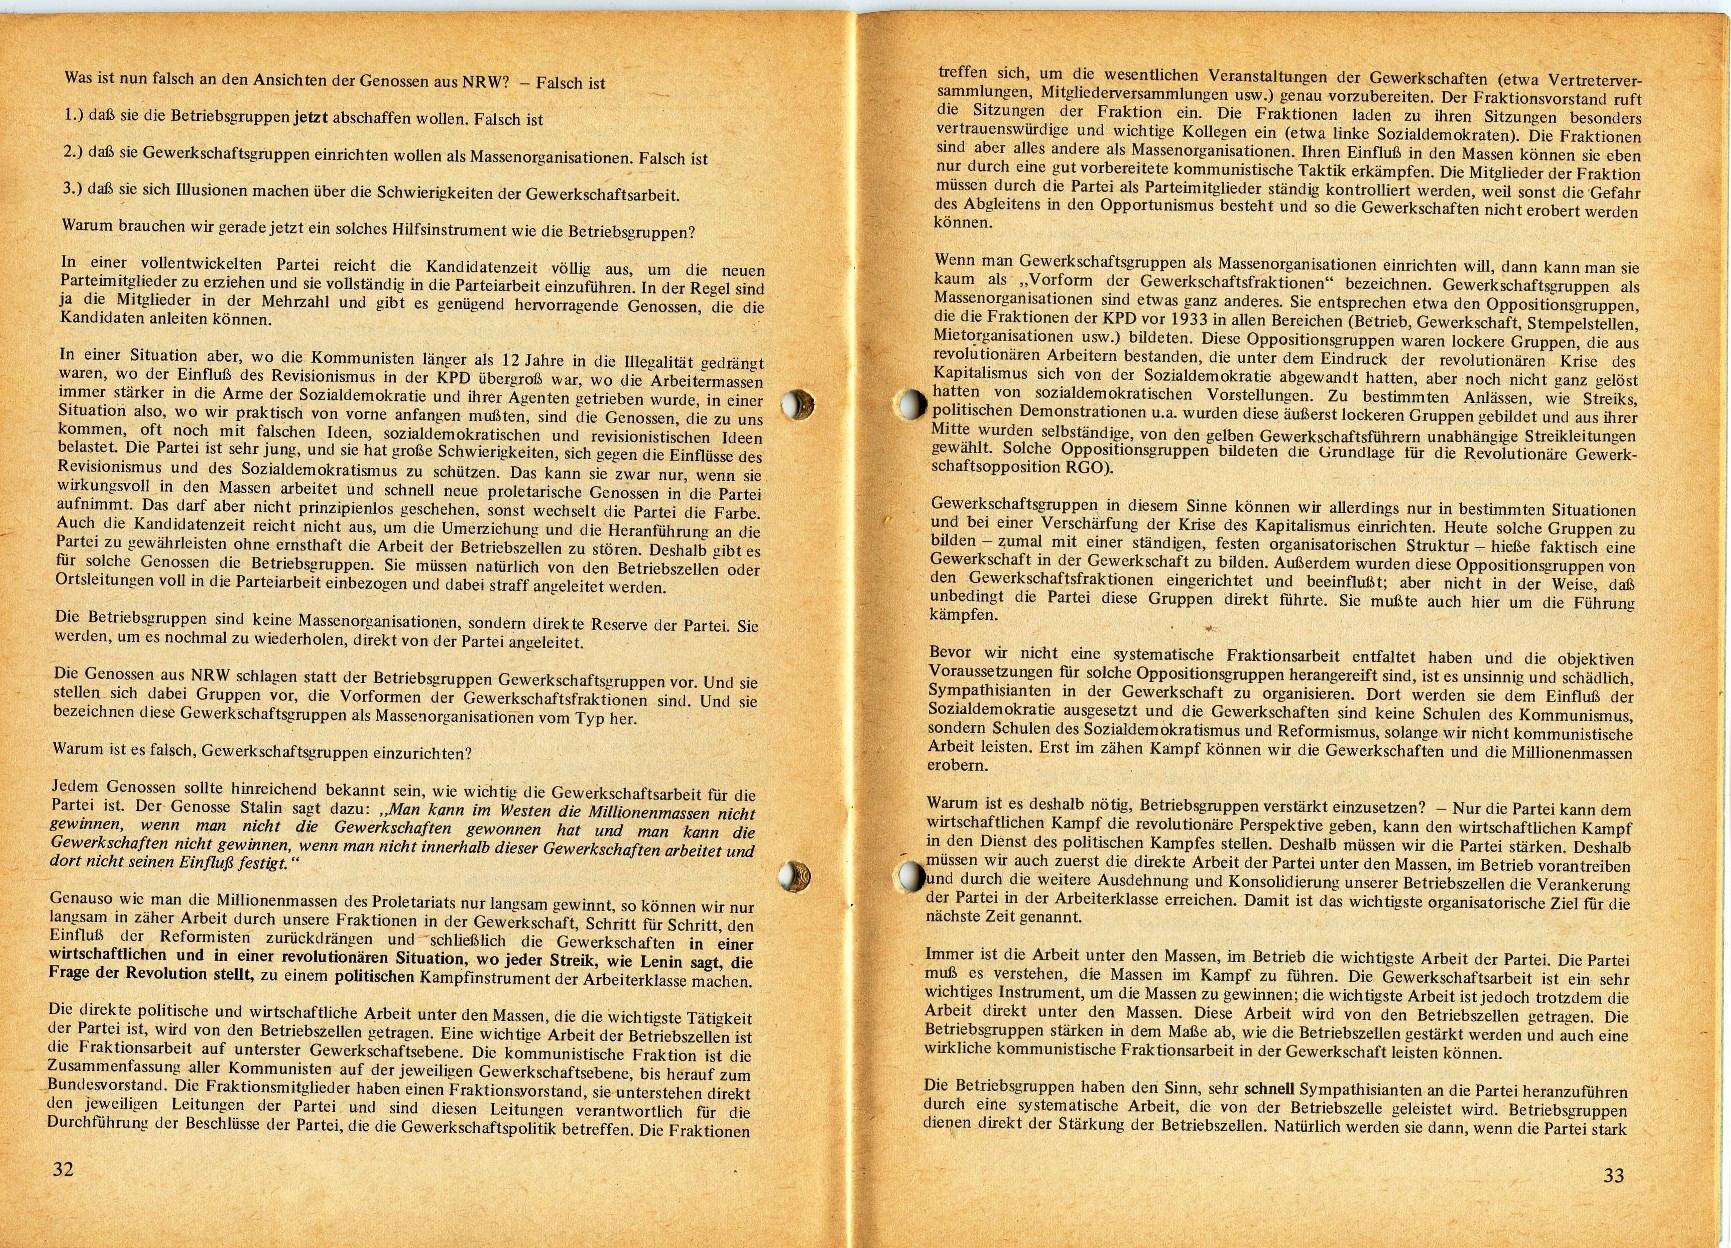 ZB_Parteiarbeiter_1970_02_18